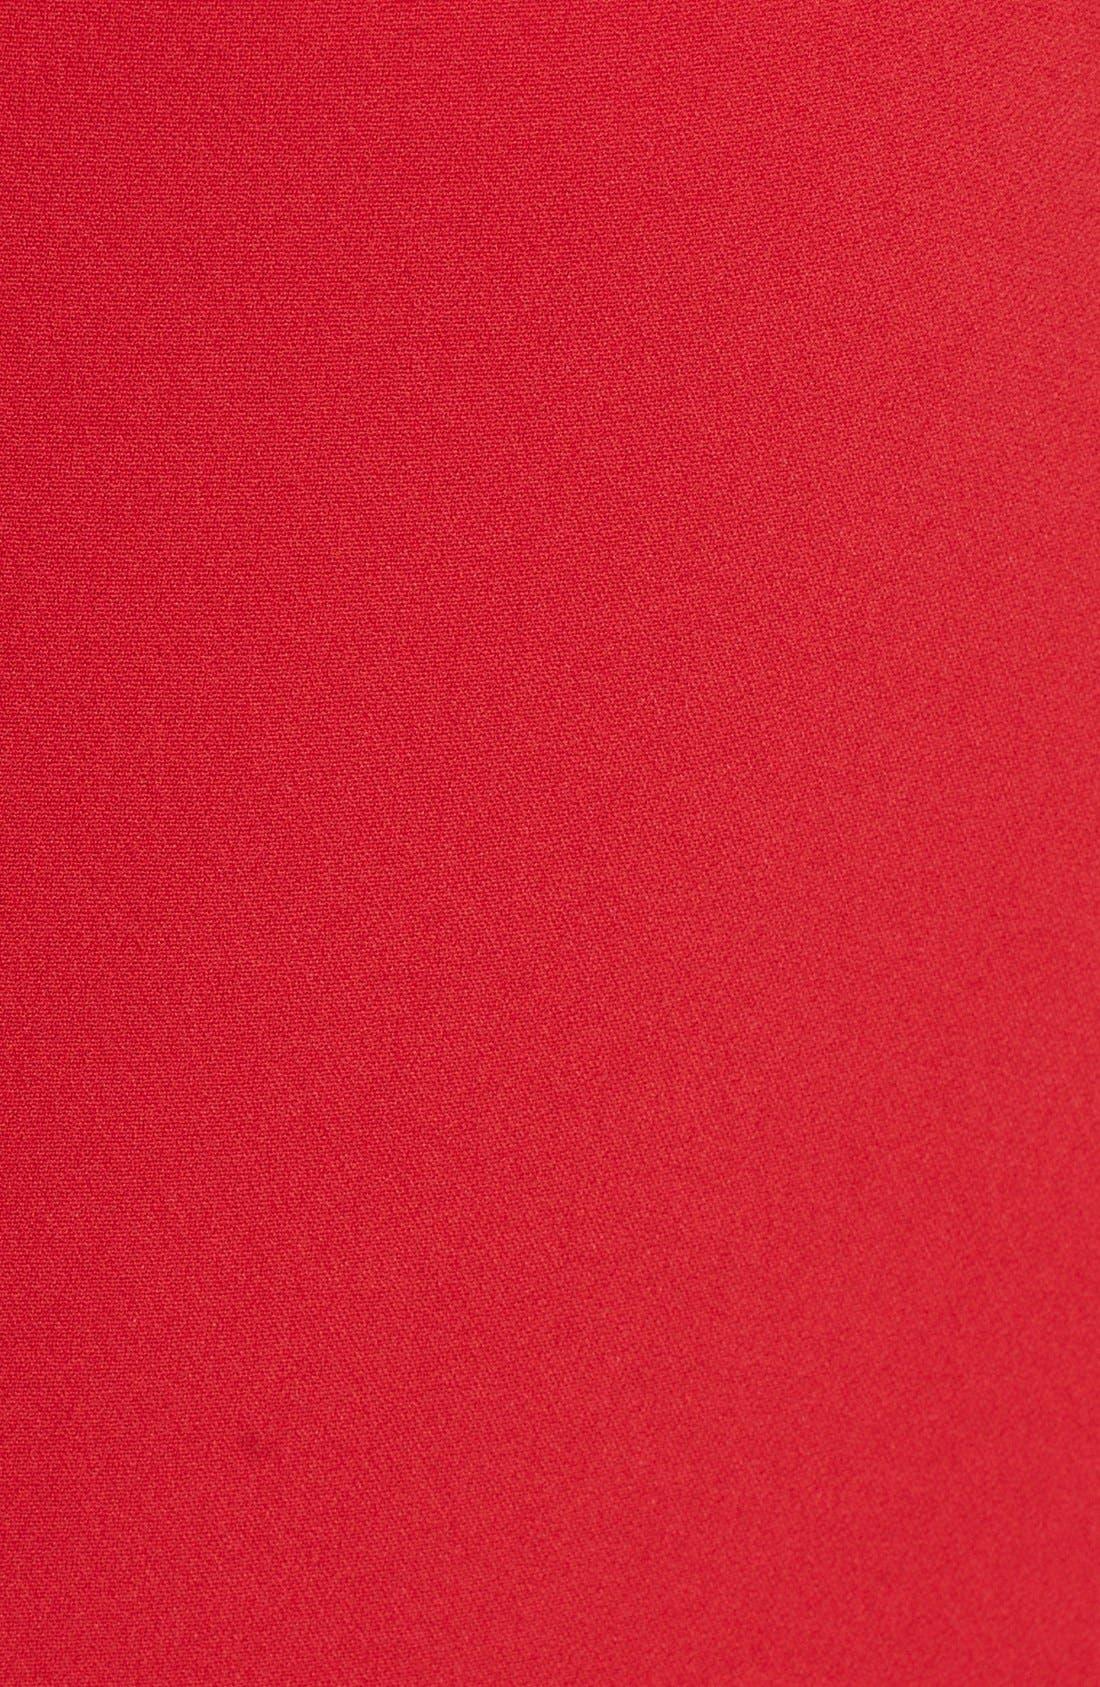 DOLCE&GABBANA, V-Back Pencil Dress, Main thumbnail 1, color, 620